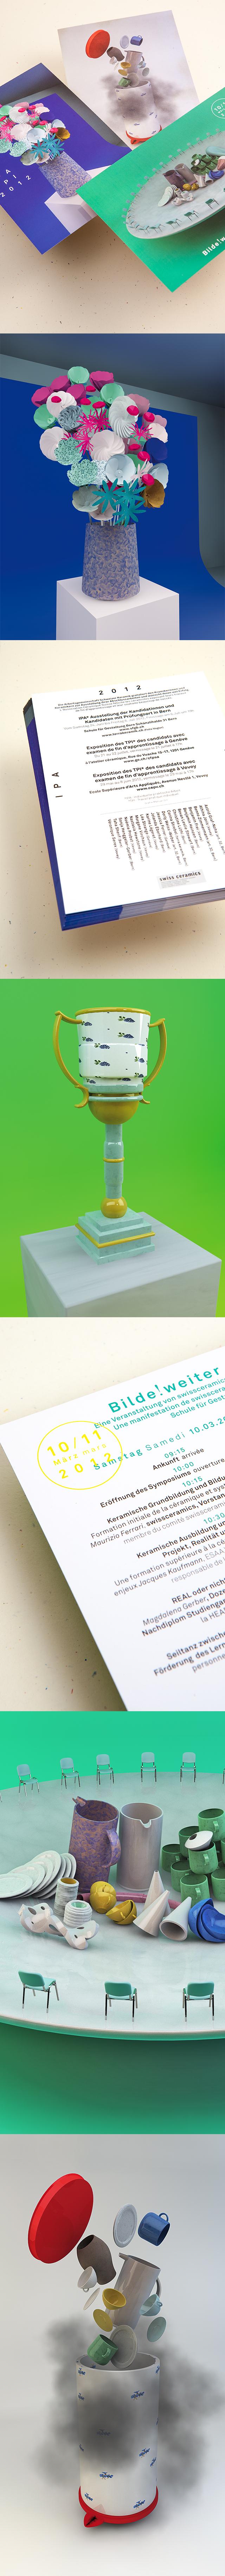 GLUNZ Projekt: Glunz Swiss-Ceramics Mobile 640x7316px